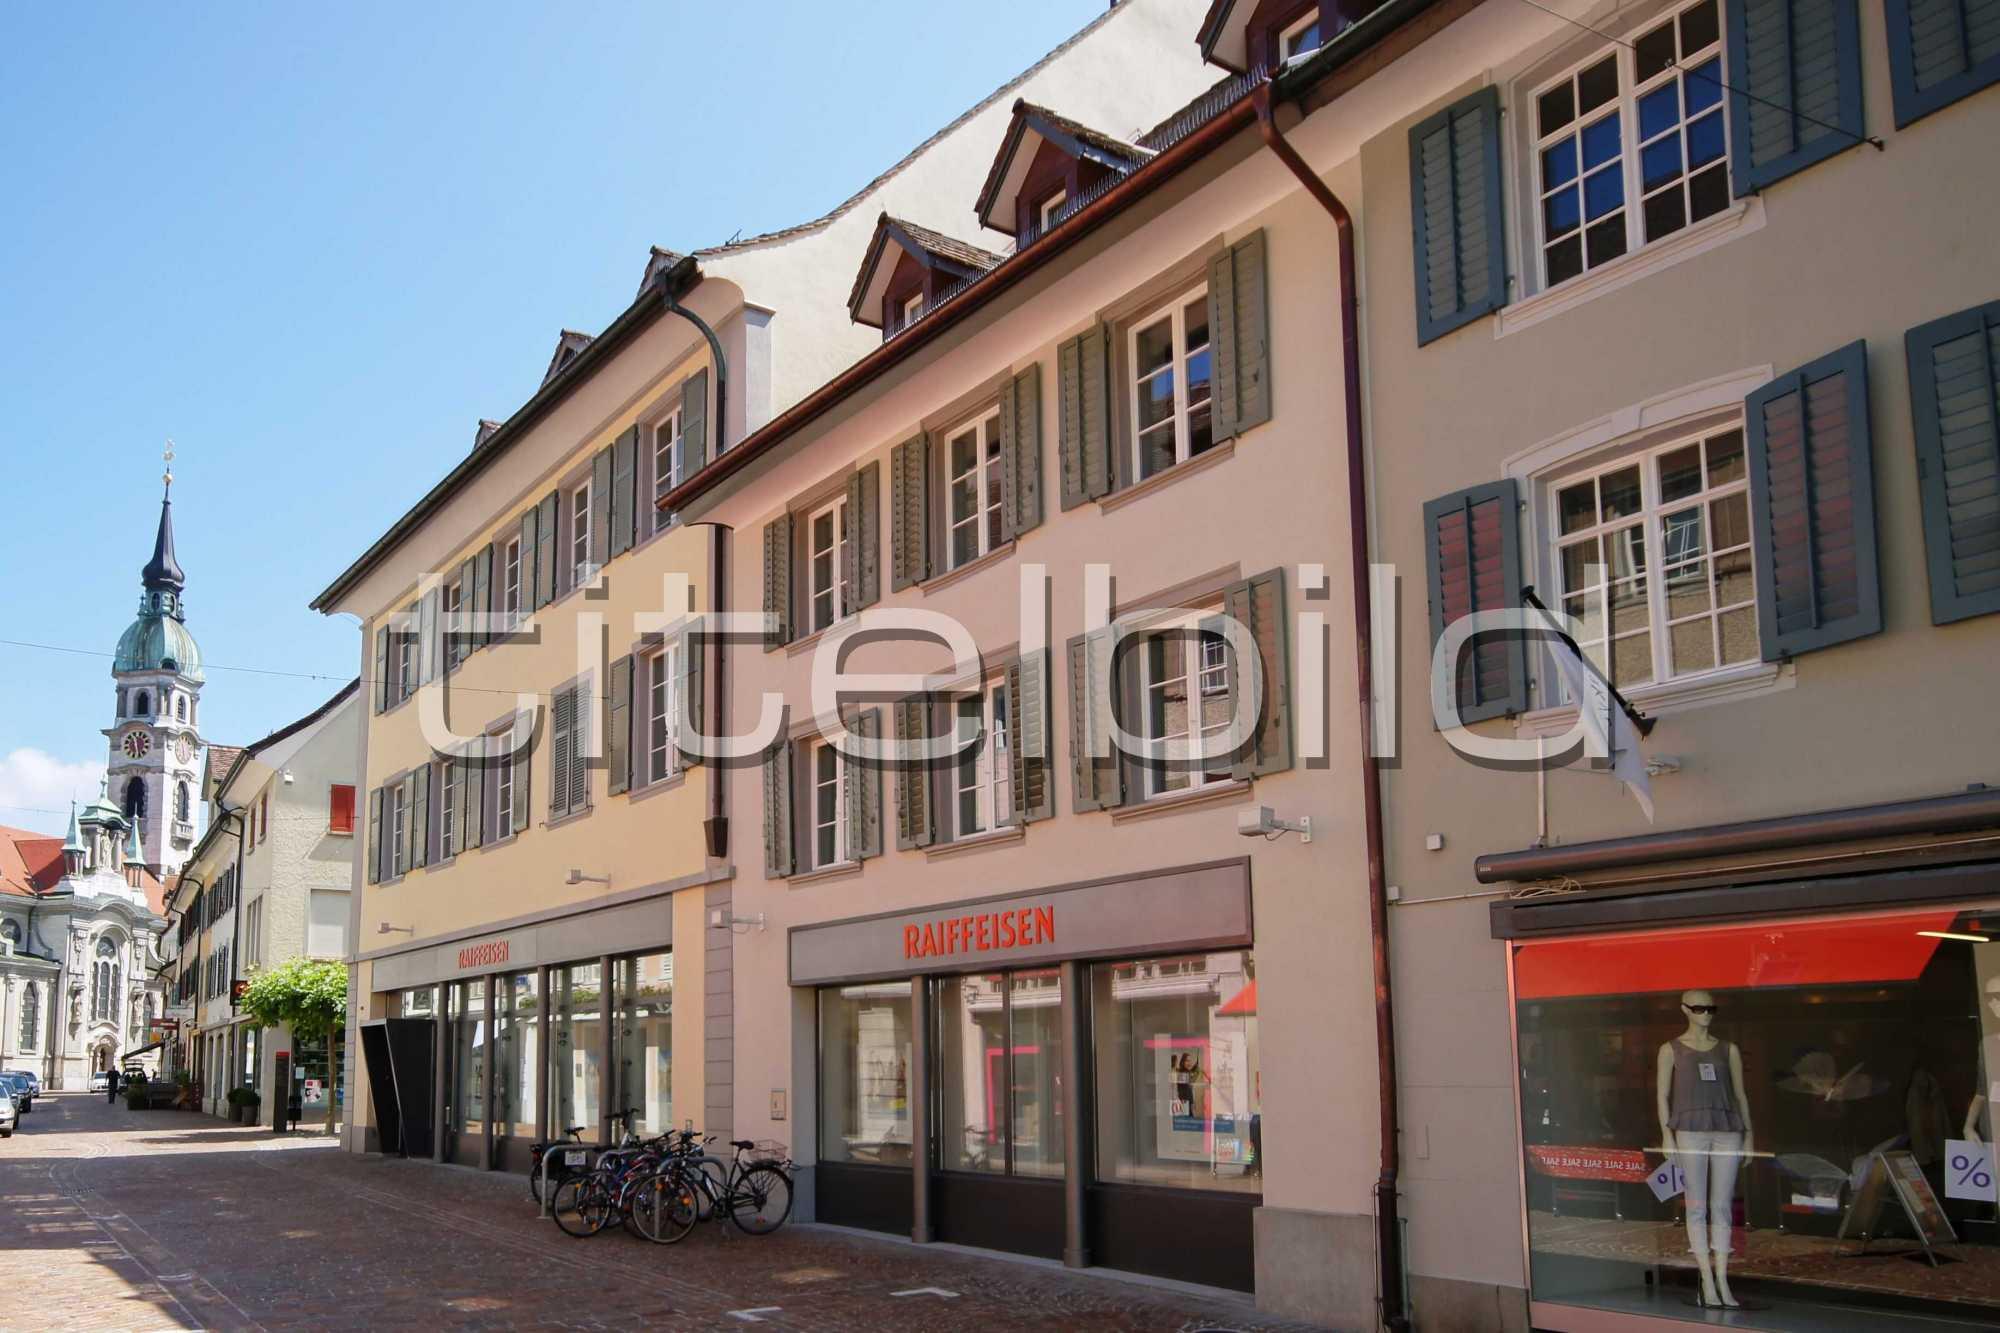 Projektbild-Nr. 4: Bankgebäude der Raiffeisenbank Frauenfeld